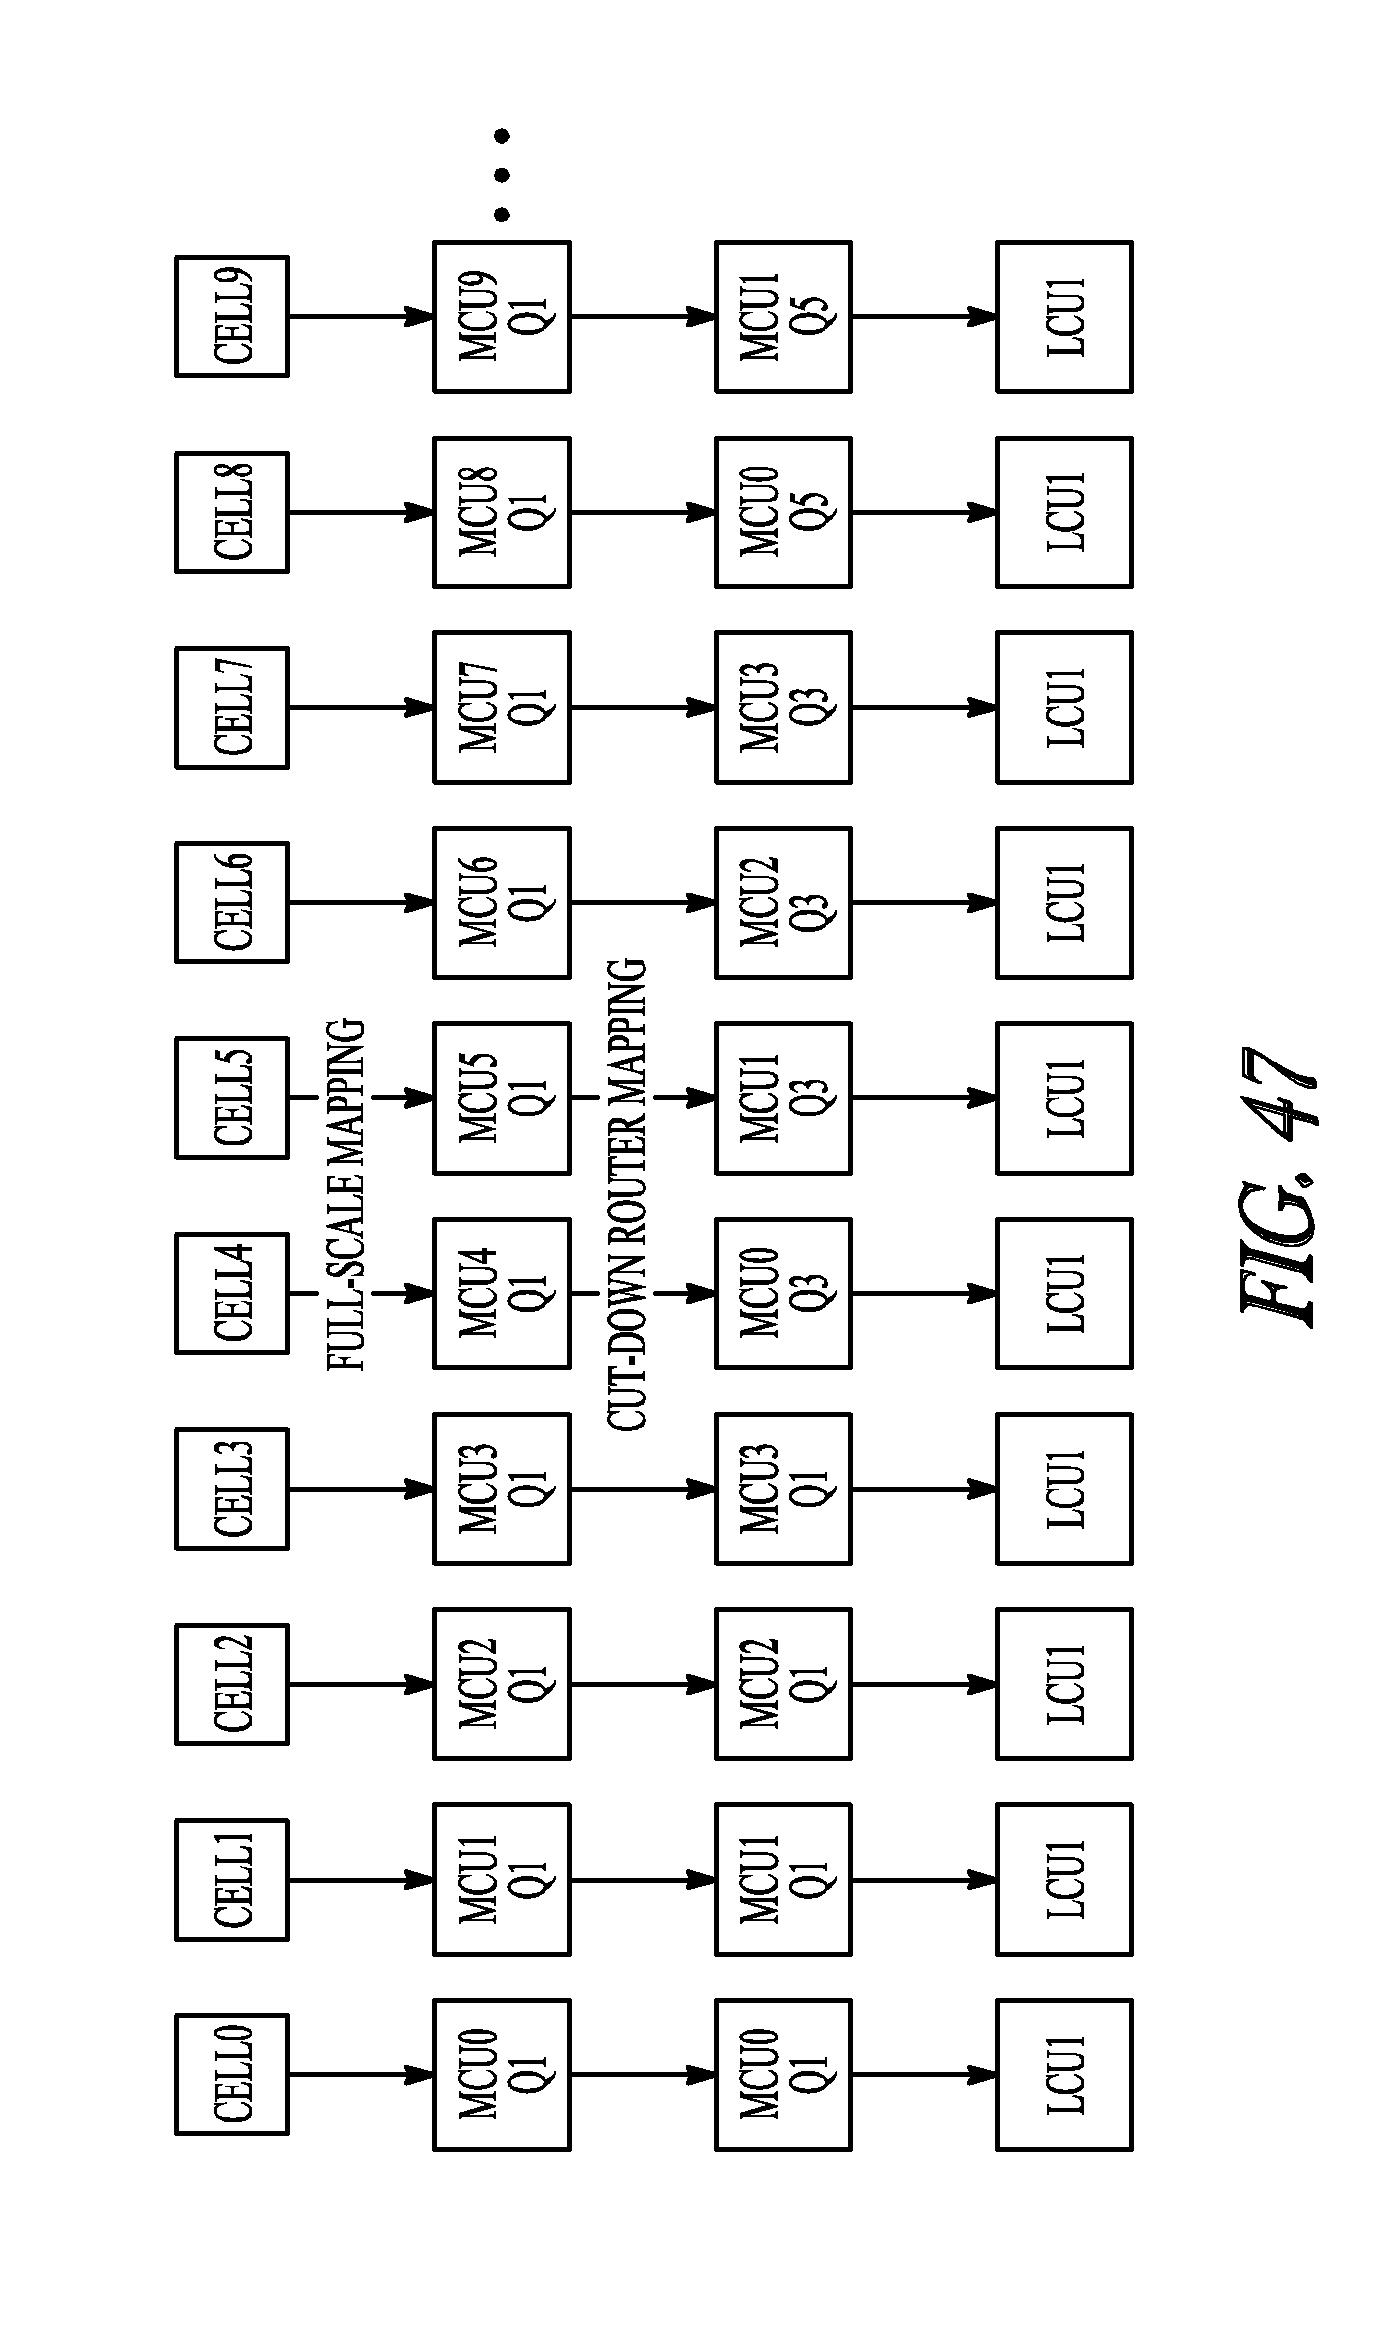 Patent US 8,270,401 B1